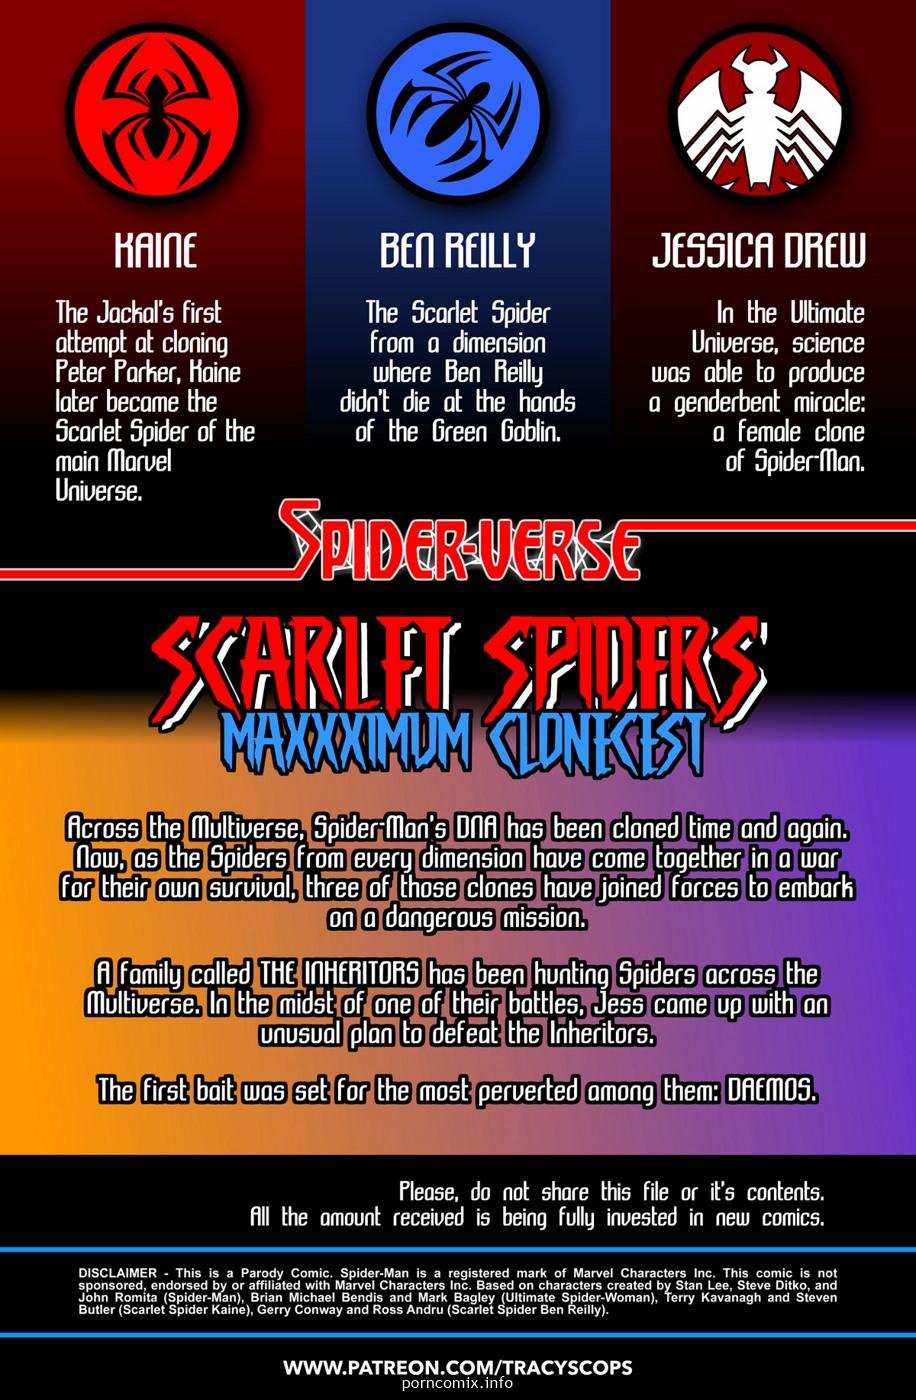 Scarlet Spiders- Maxxximum Clonecest, Spiderman